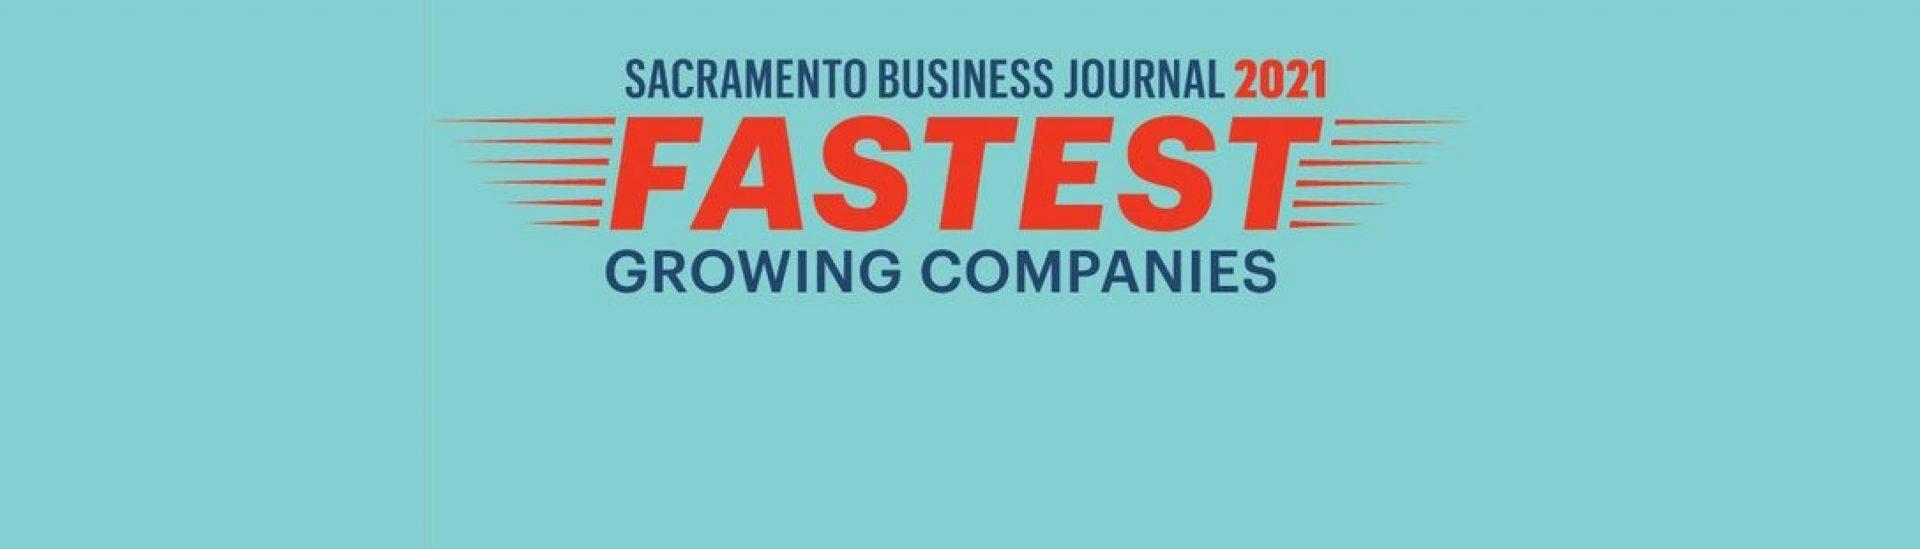 Studio W Architects #21 Fastest Growing Company in Sacramento Region